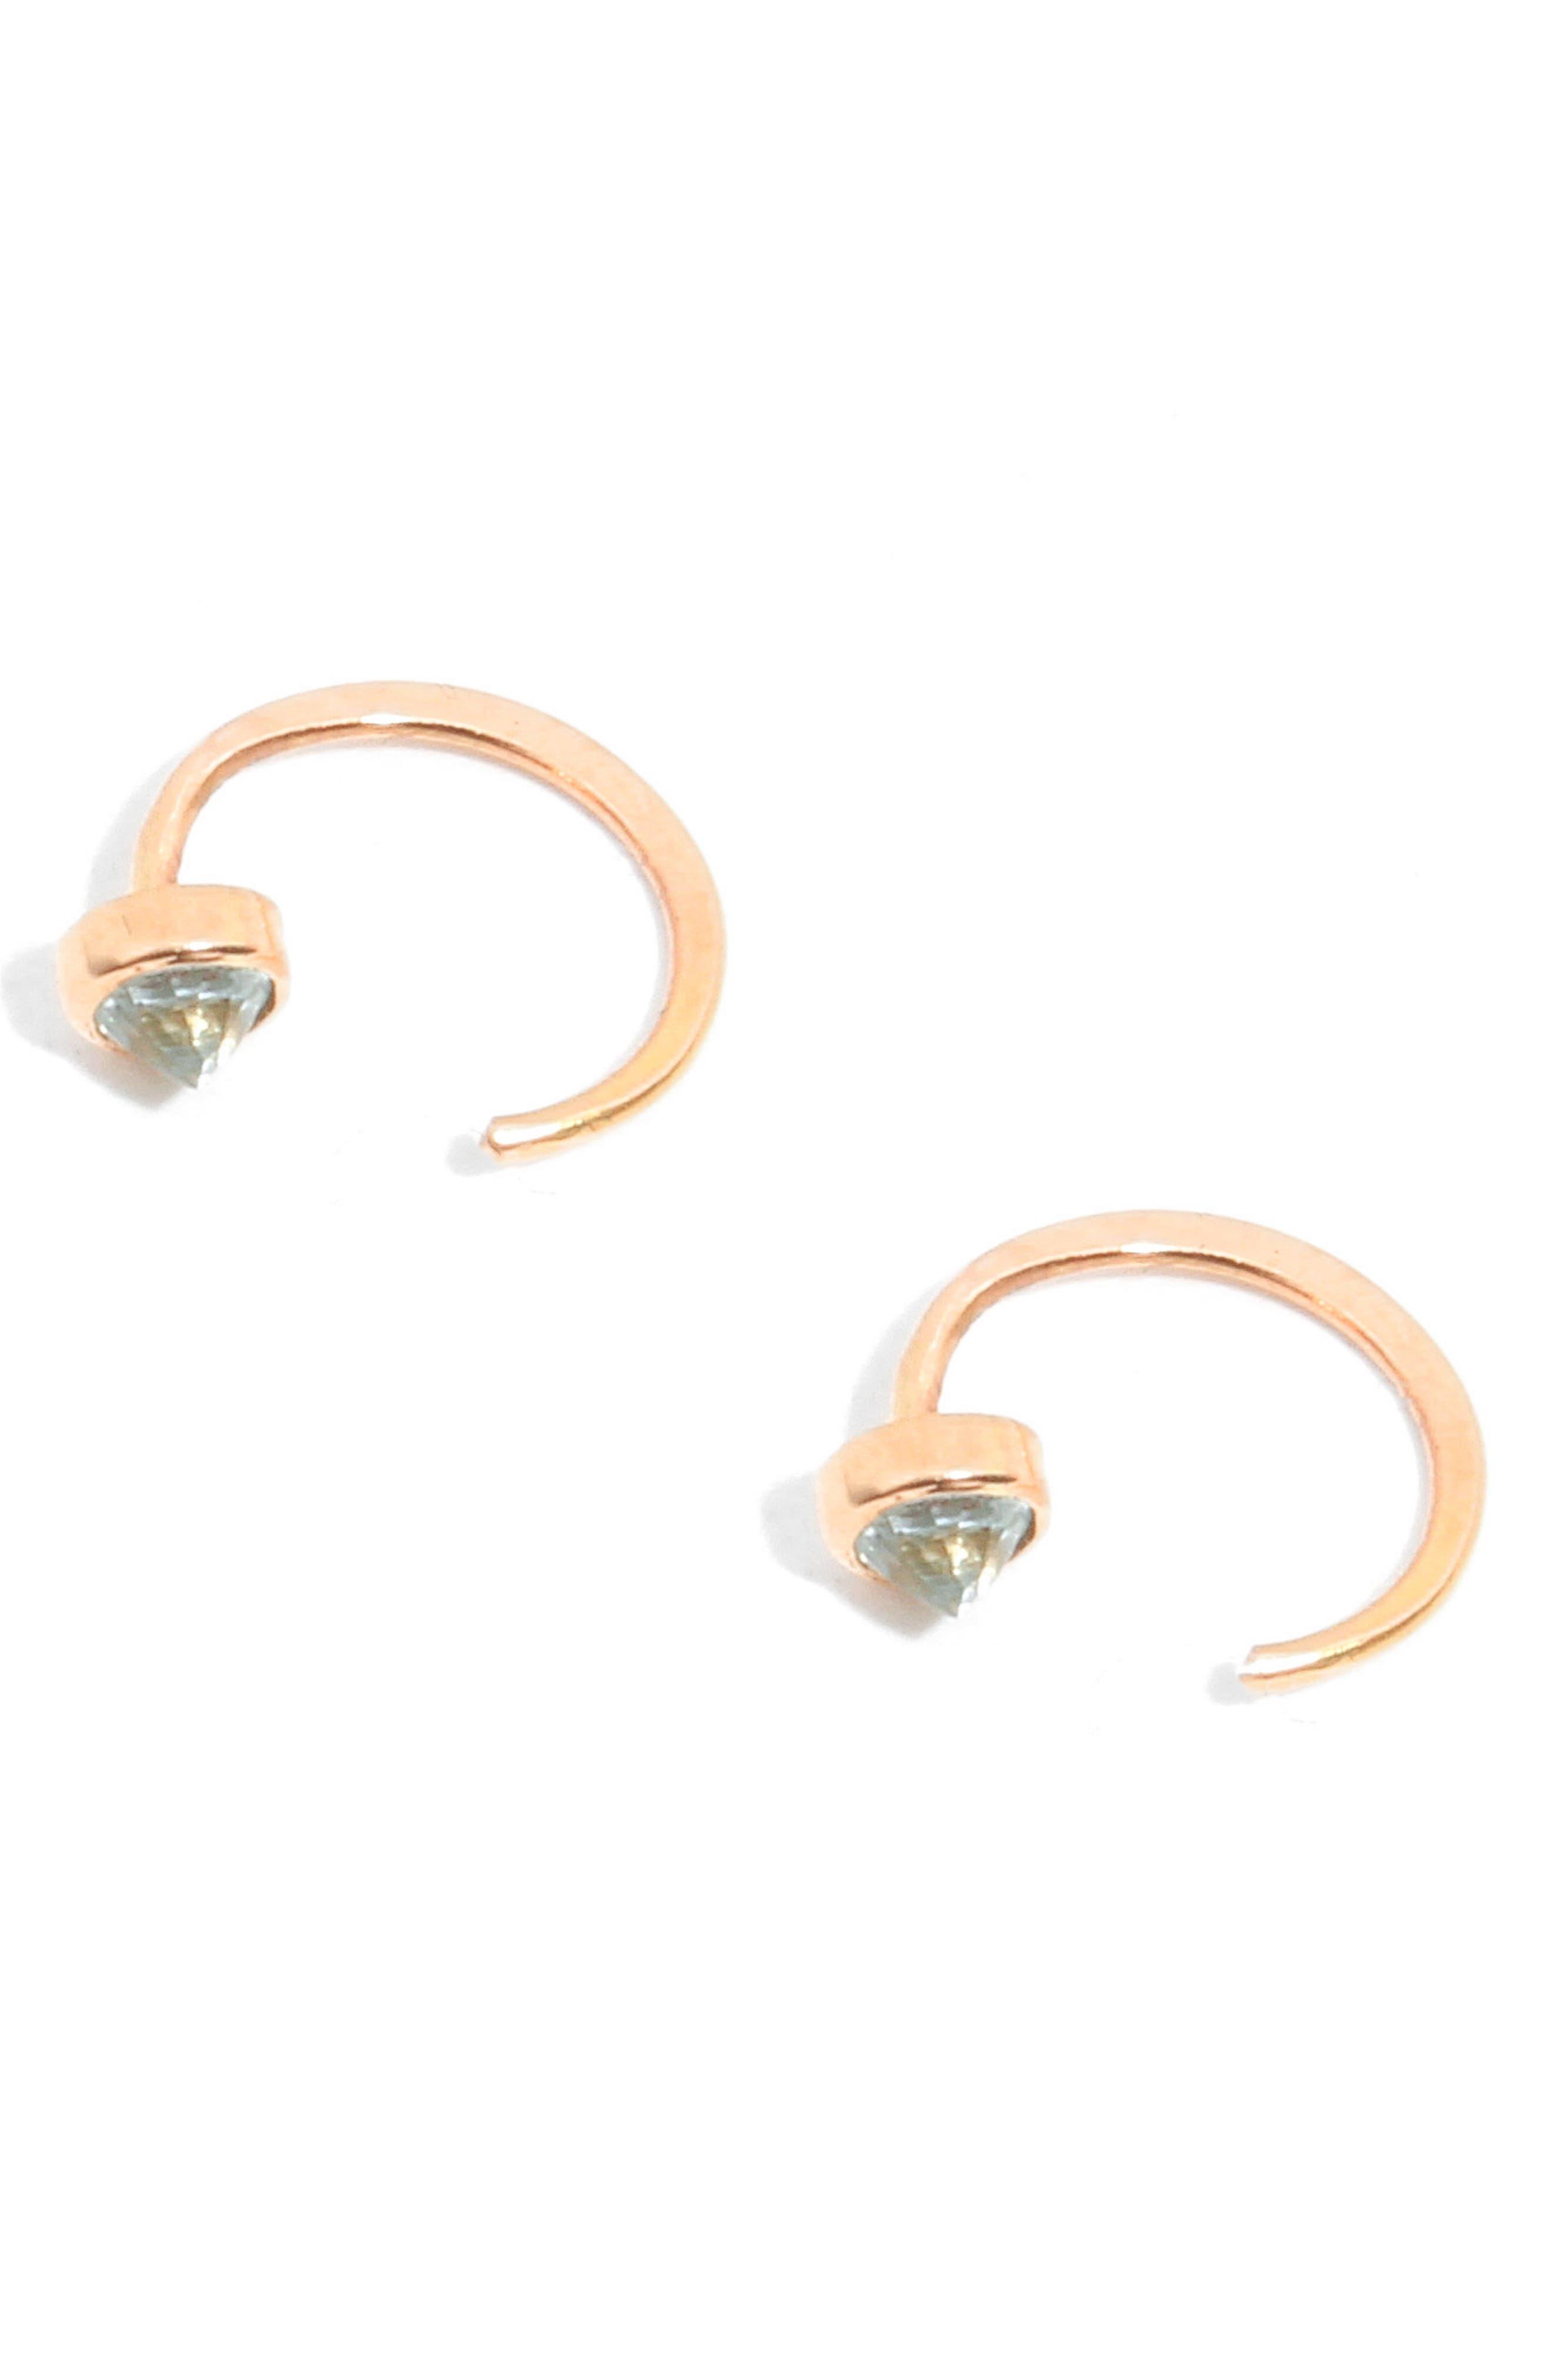 Topaz Hug Hoop Earrings,                             Alternate thumbnail 3, color,                             710